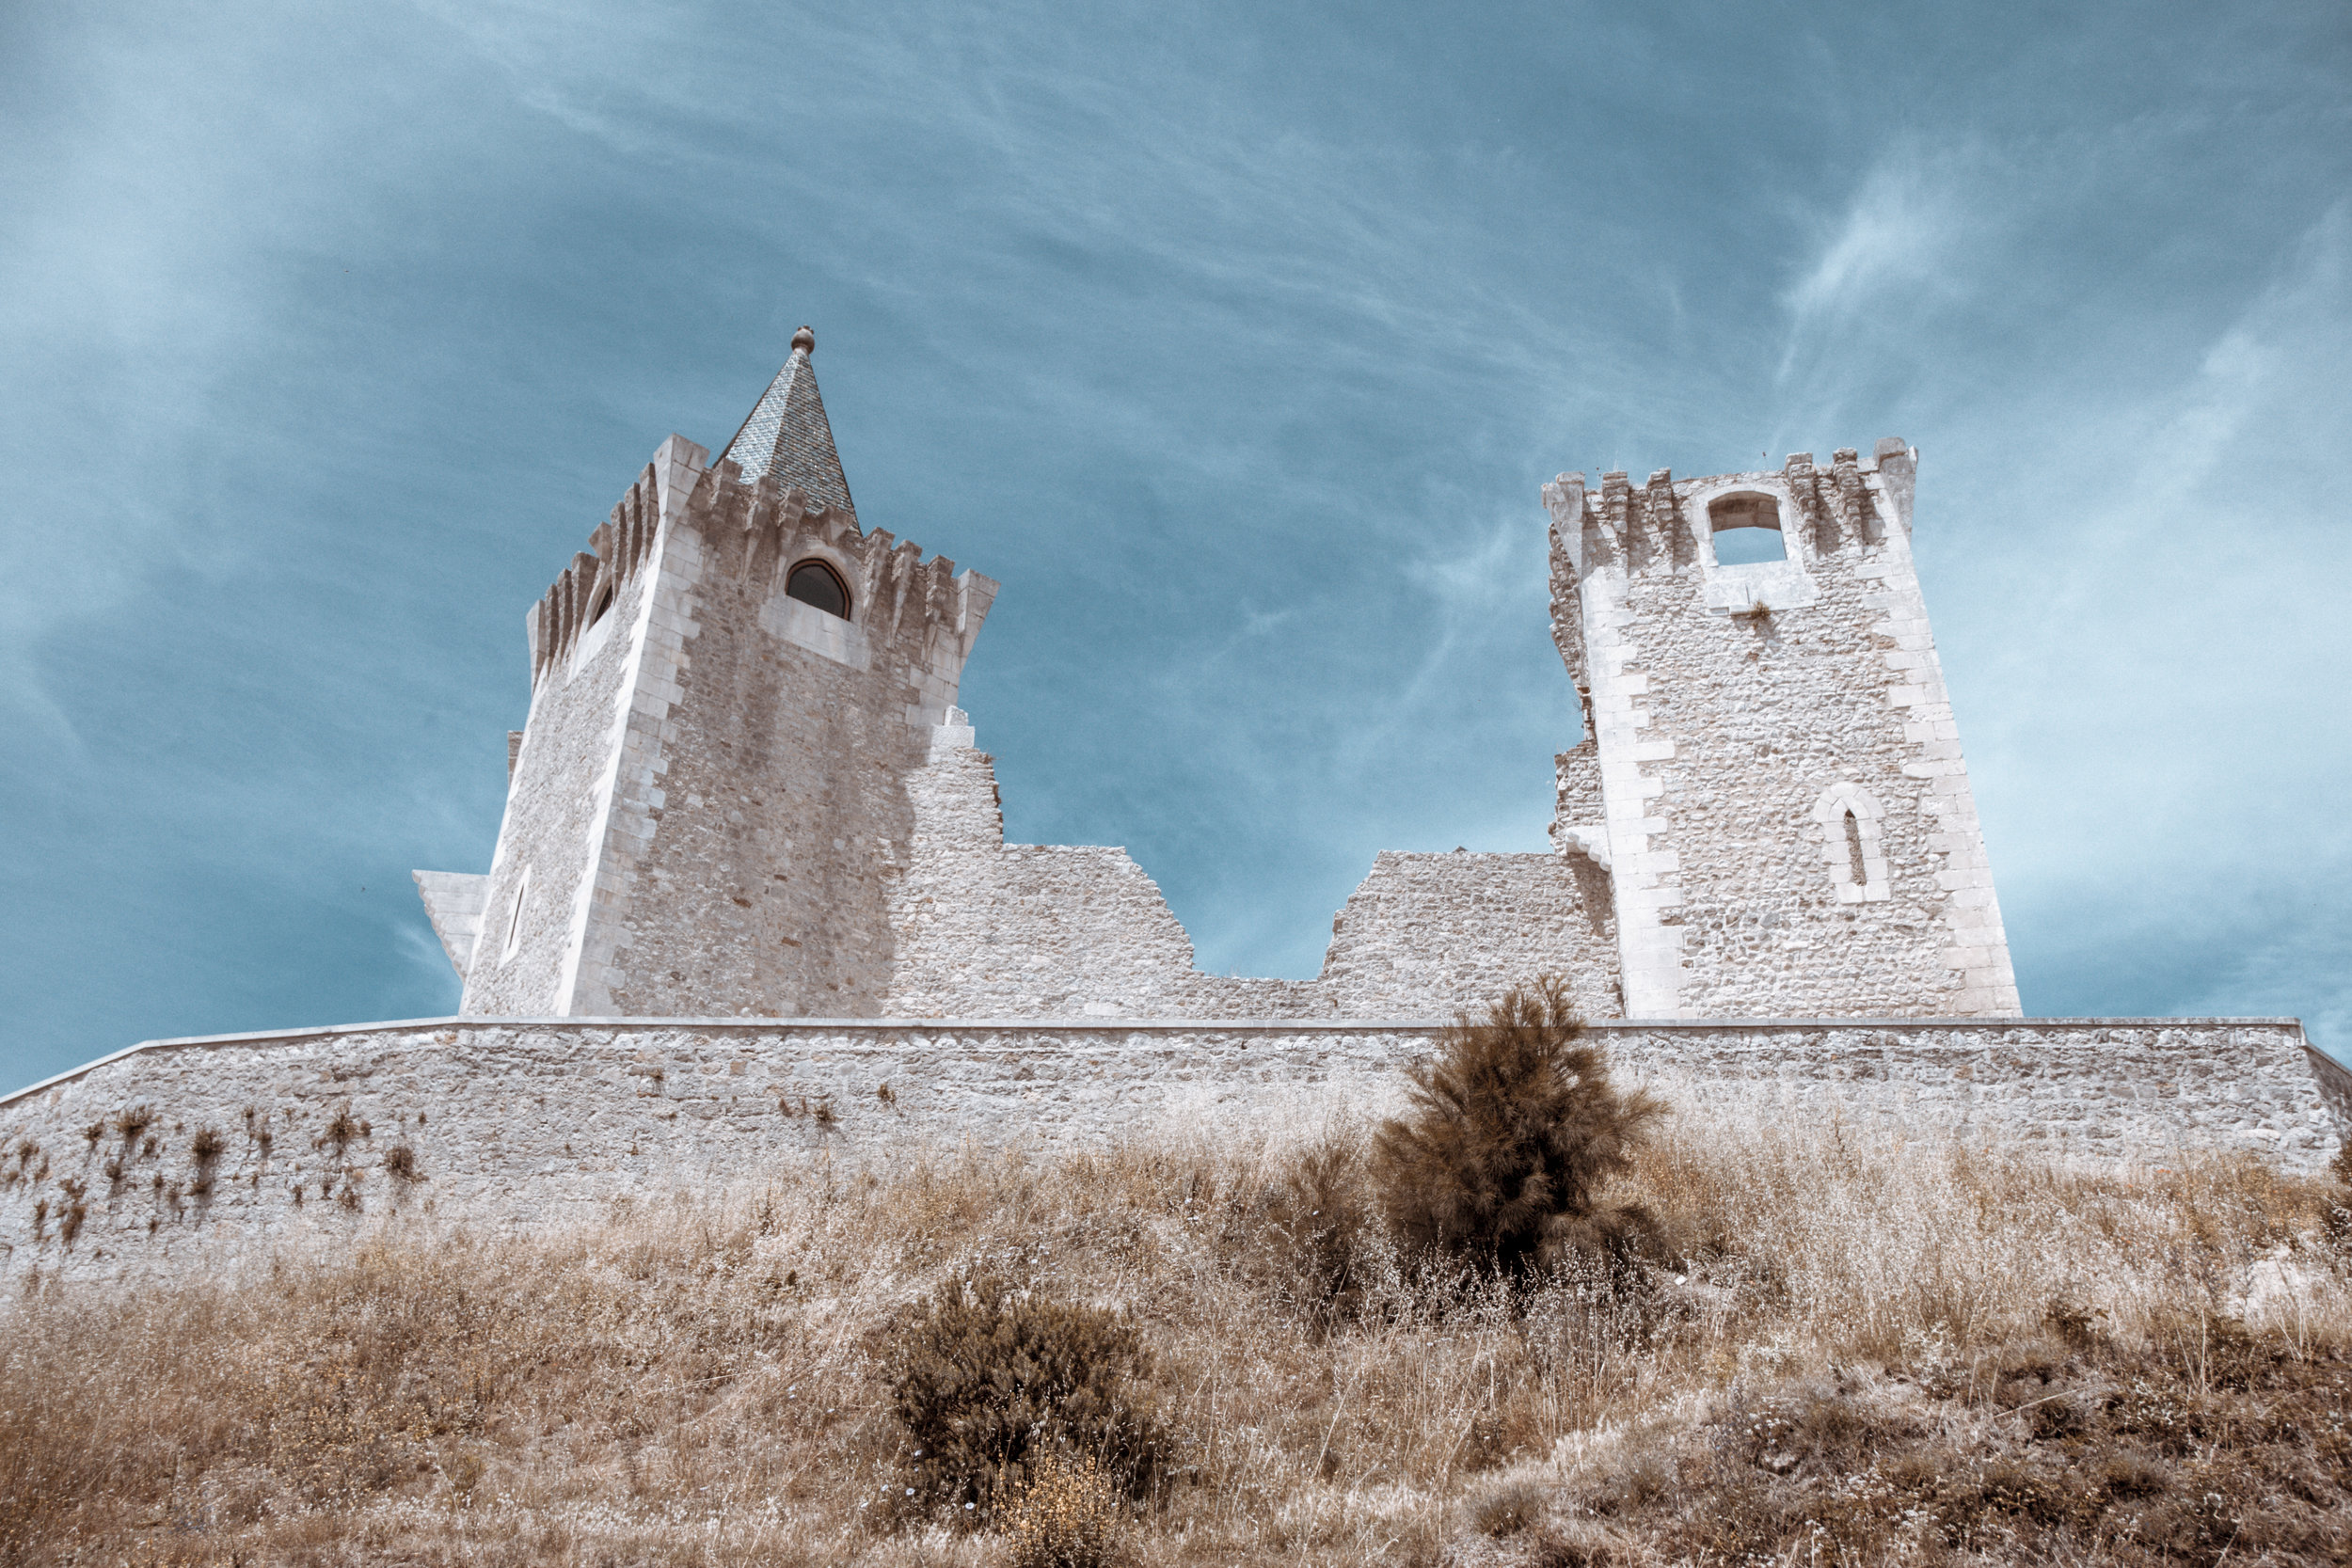 Porto de Mós Castle - Recovering Project by Arch. Domingues Santos Silva